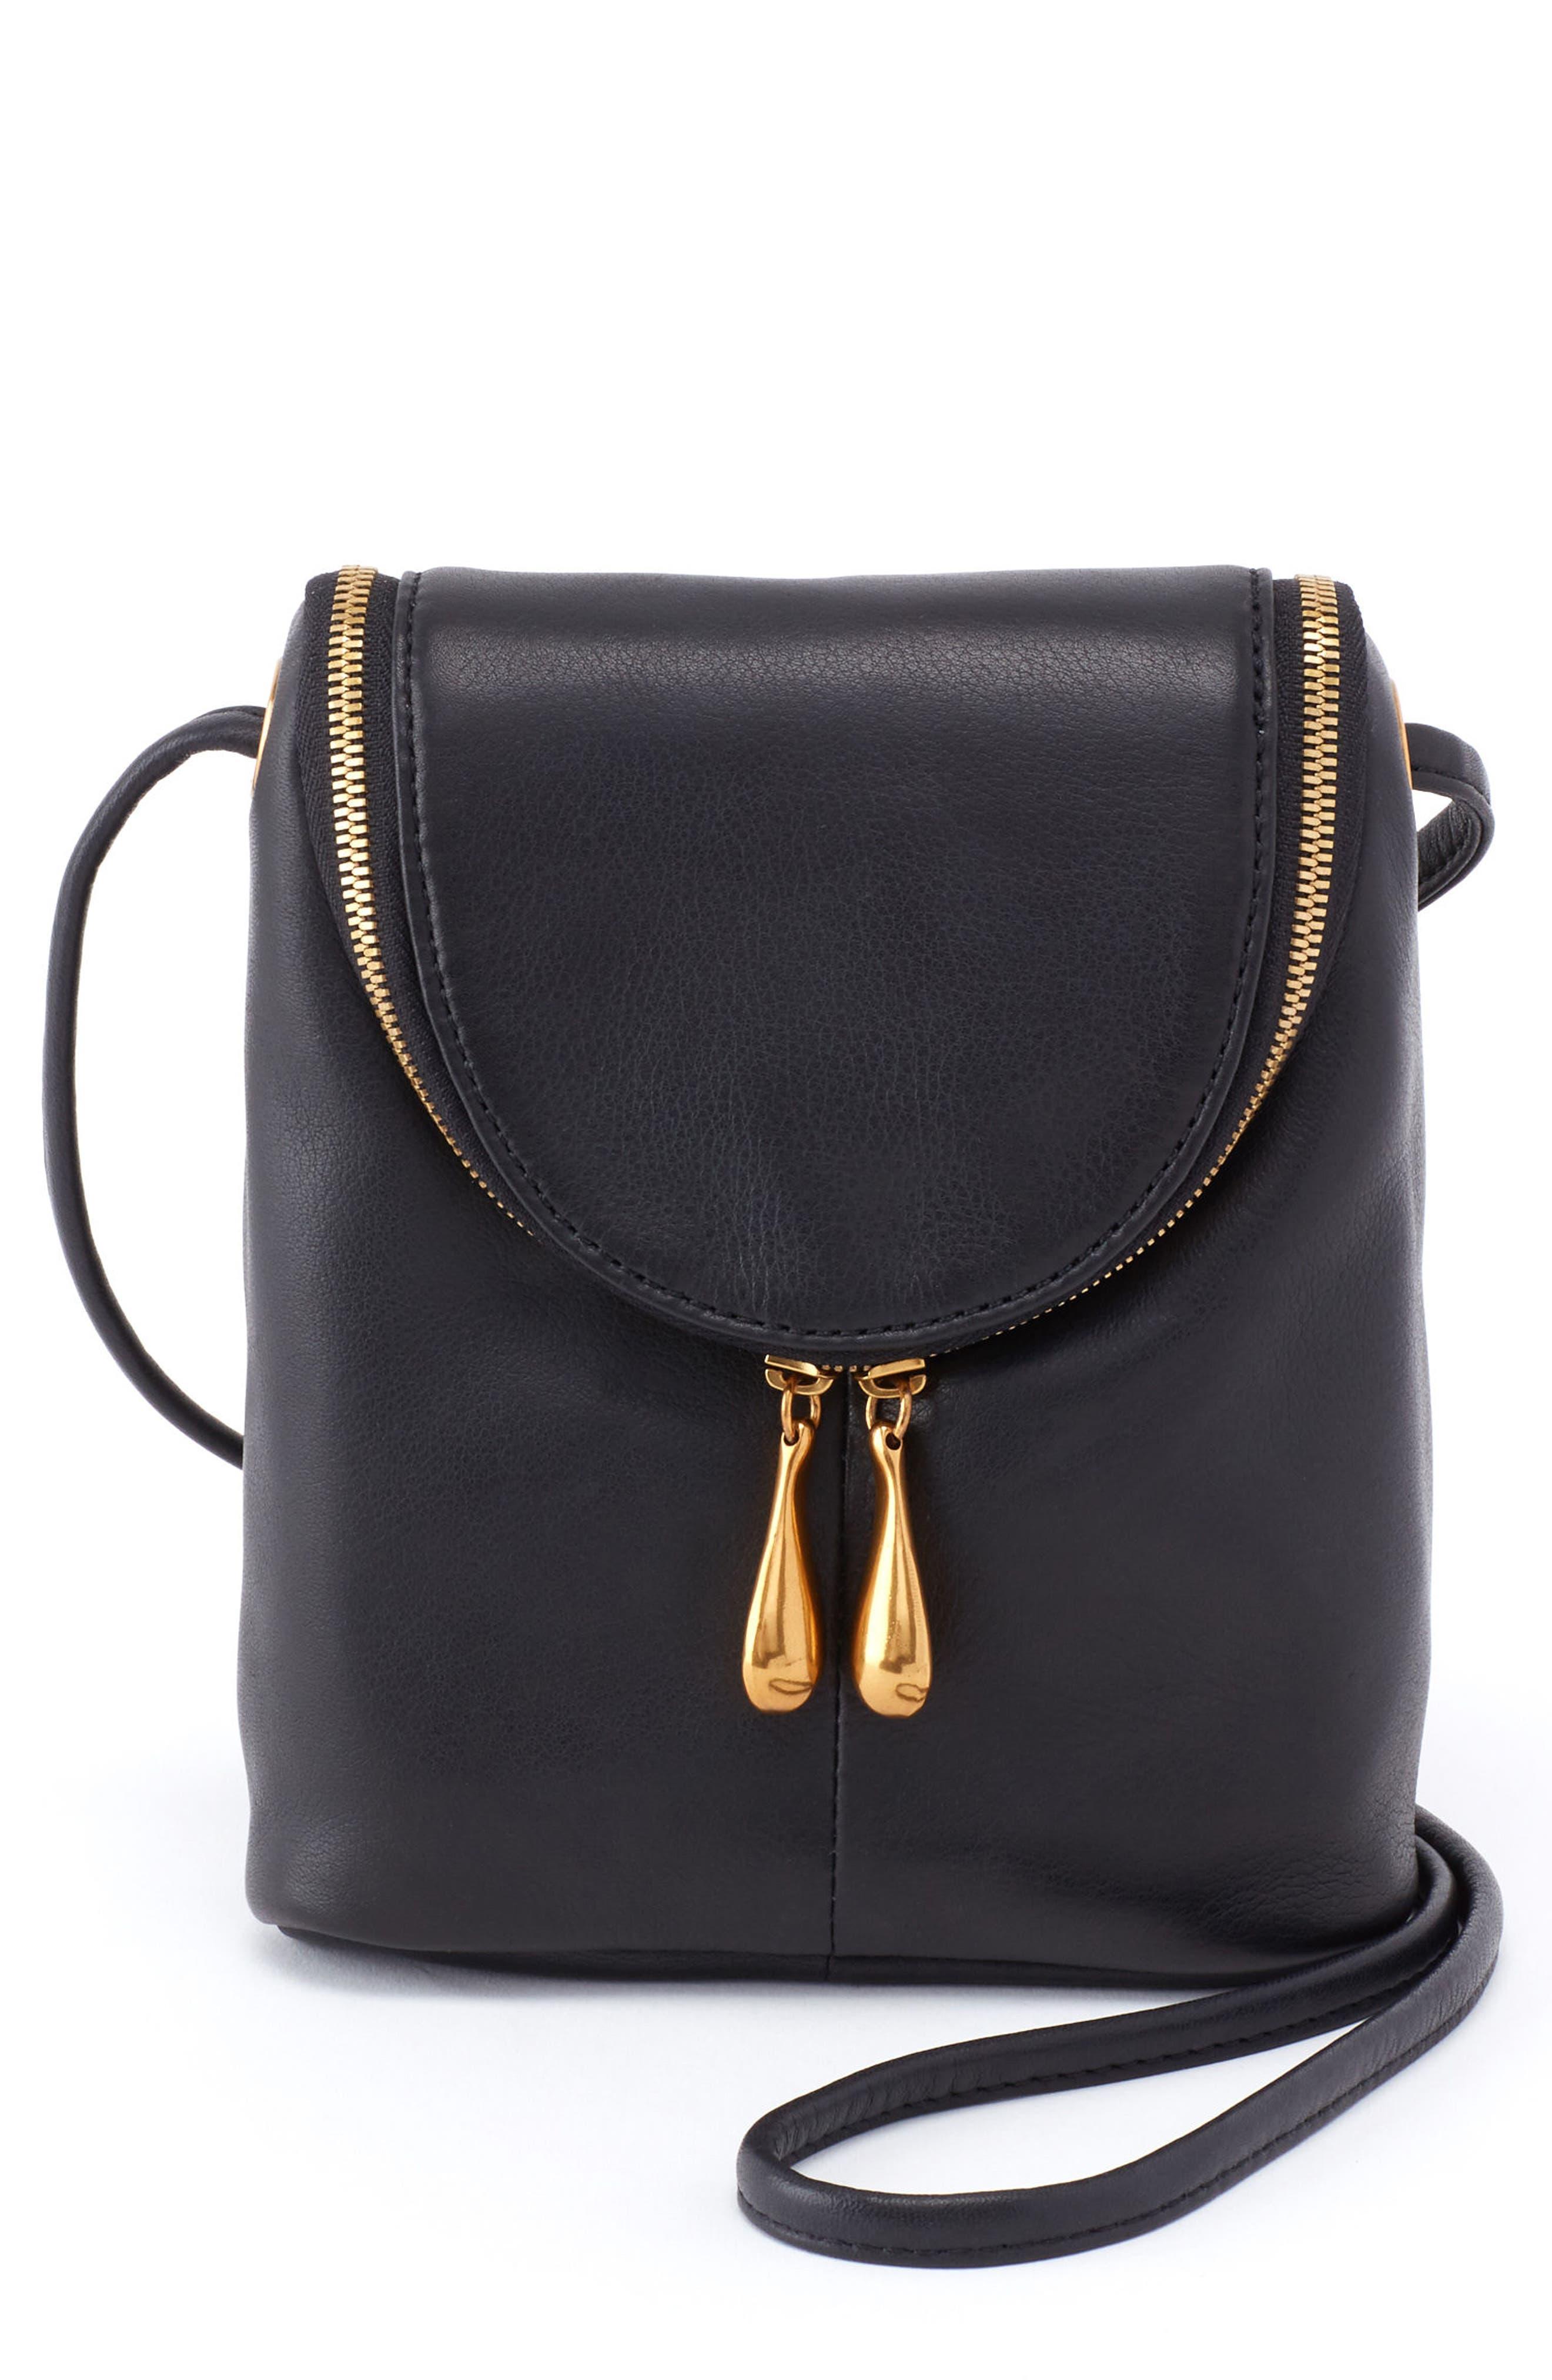 Fern Saddle Bag